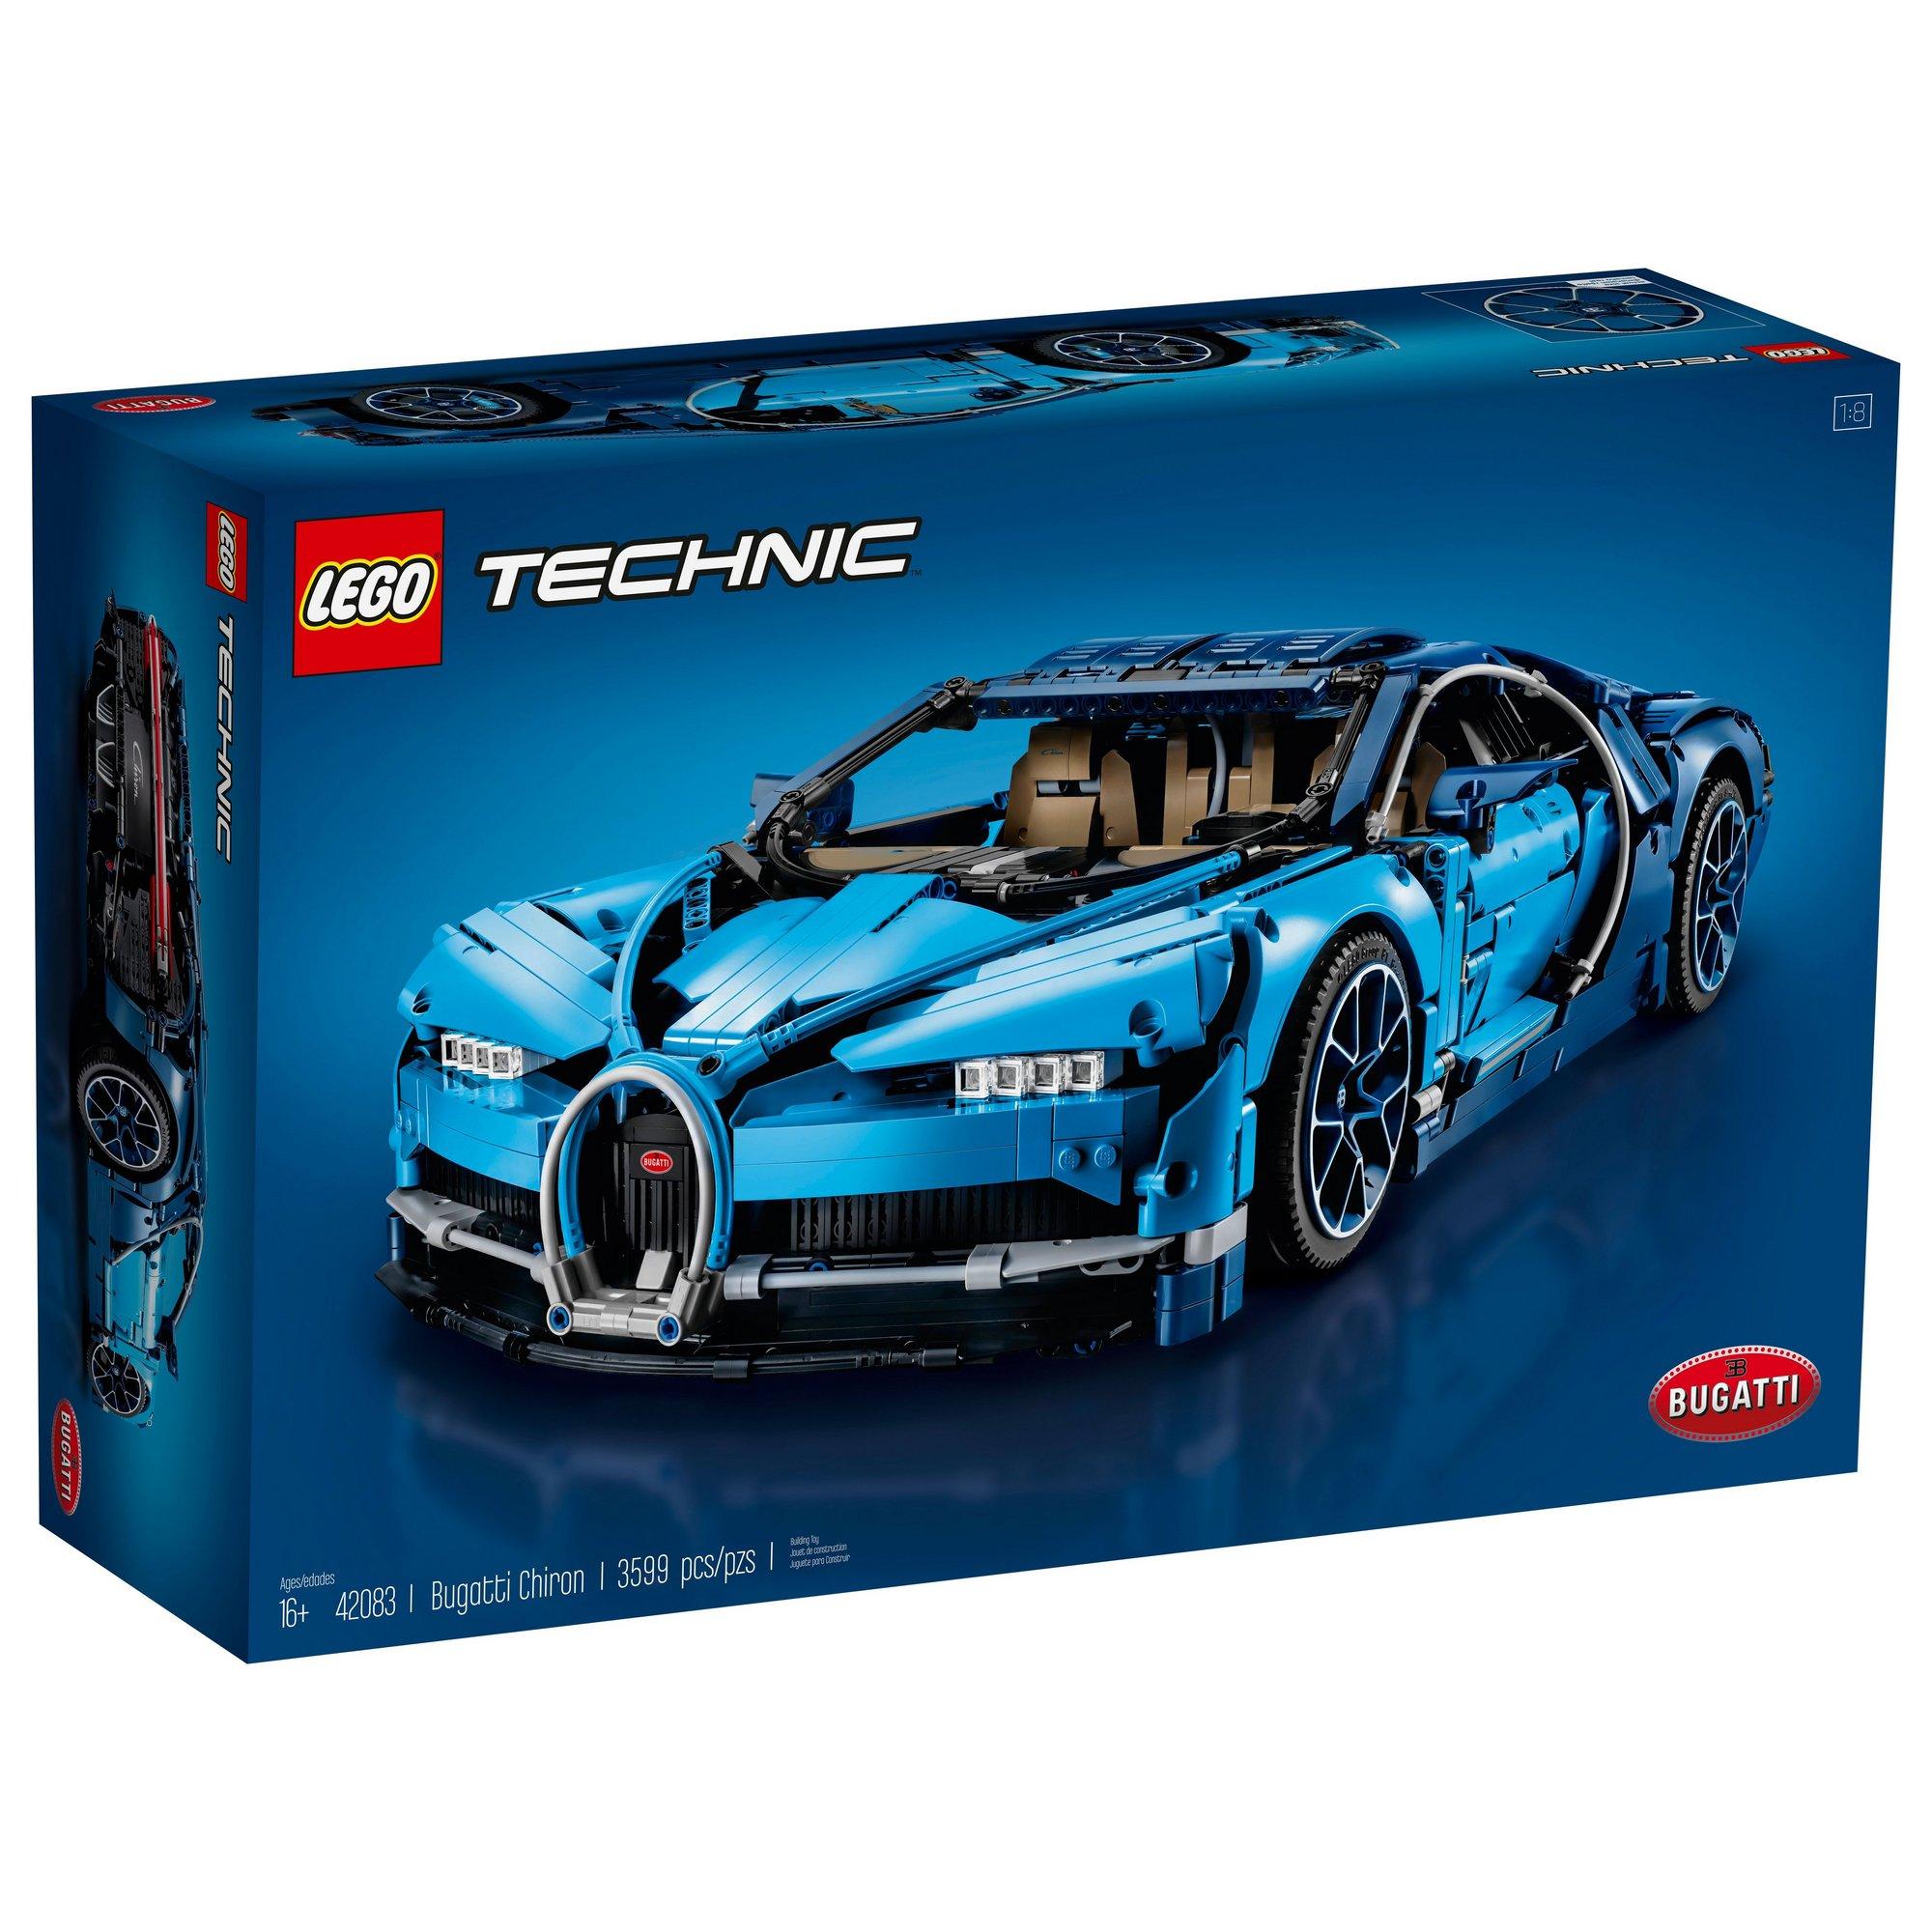 Image of LEGO Technic Bugatti Chiron